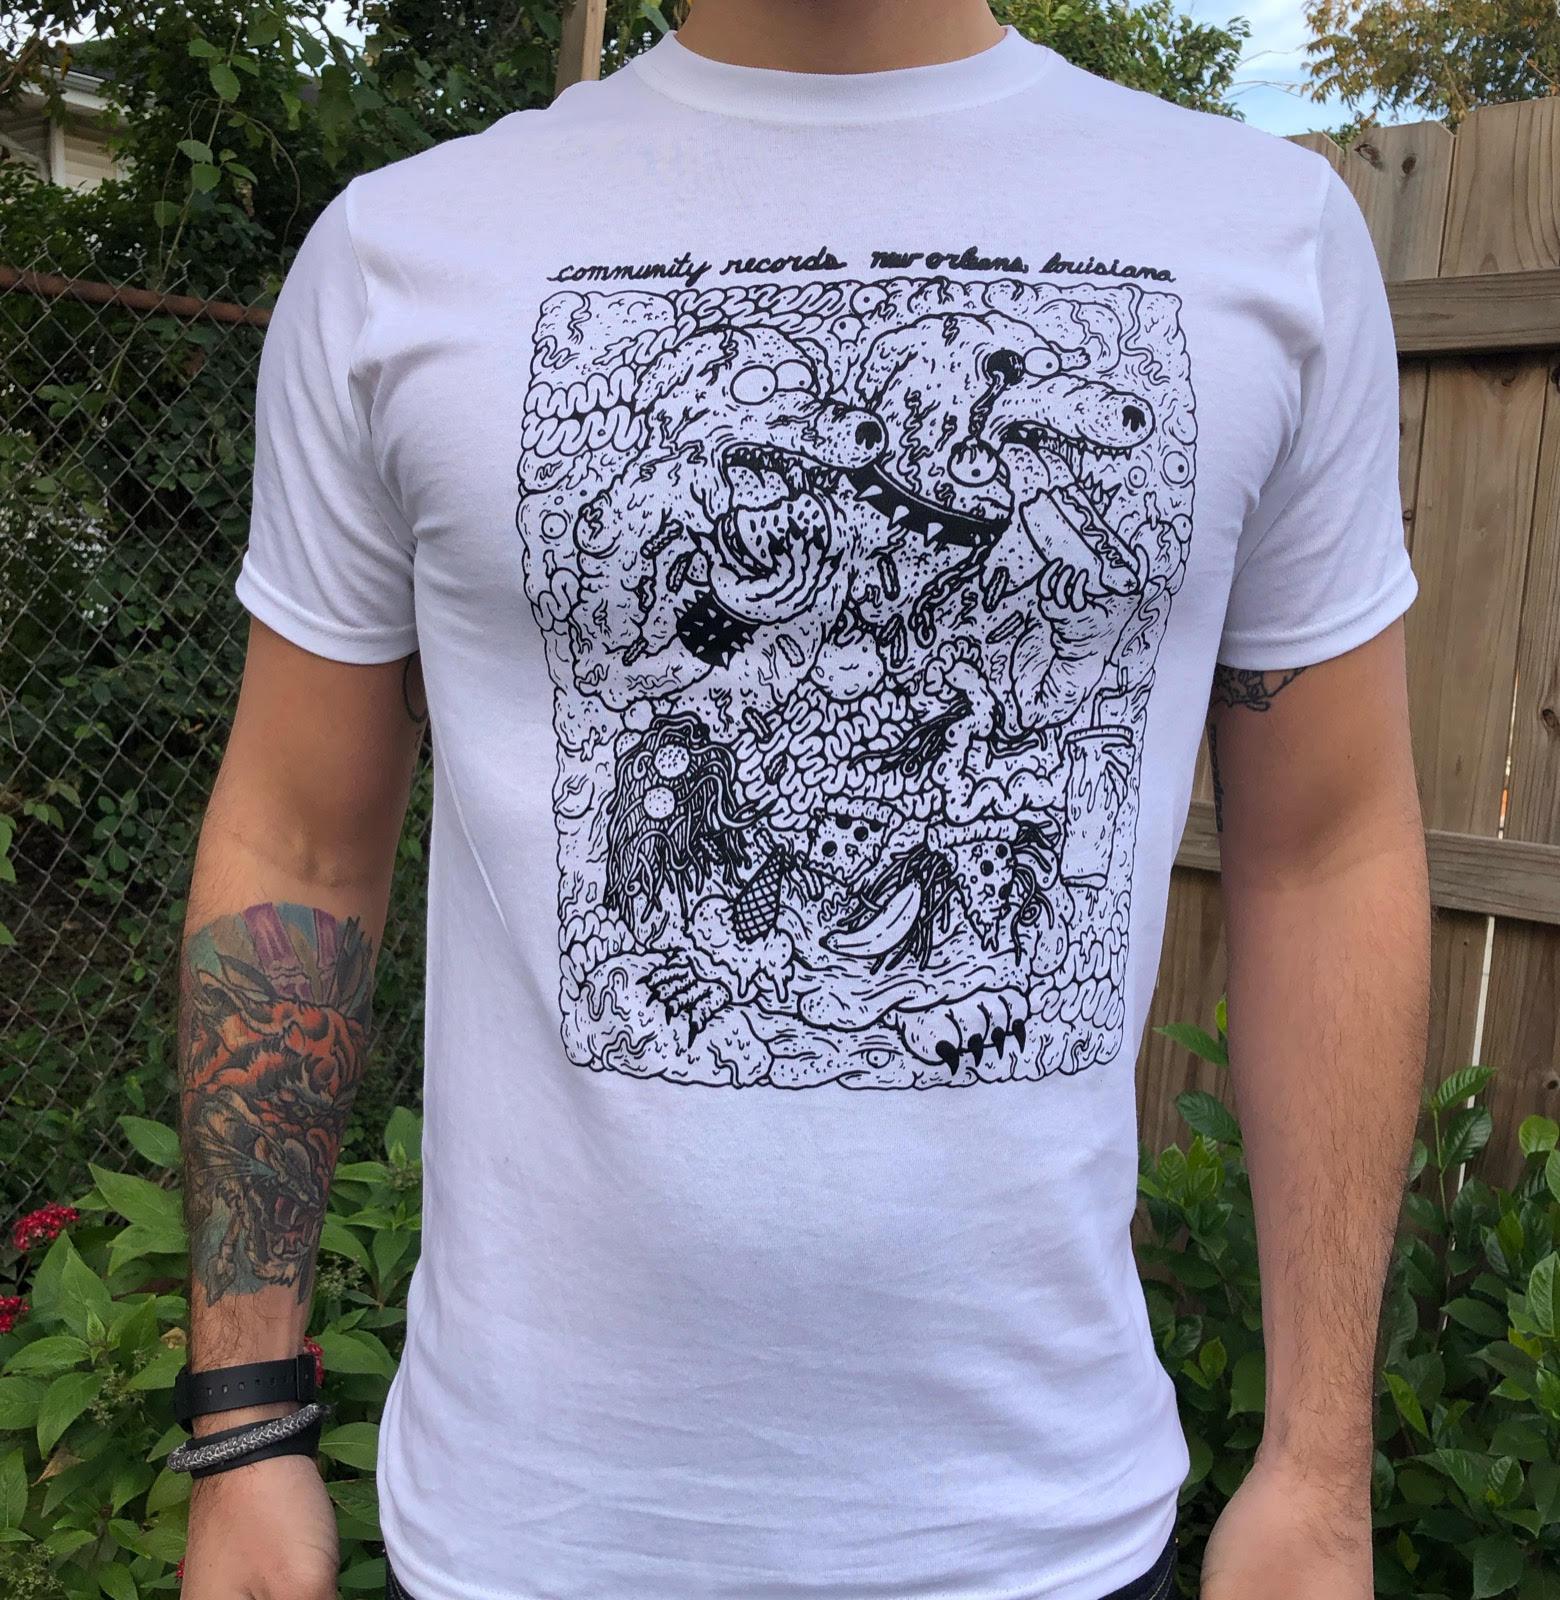 fef562003 COMMUNITY RECORDS - Community Records - Blob Shirt (black ink on ...